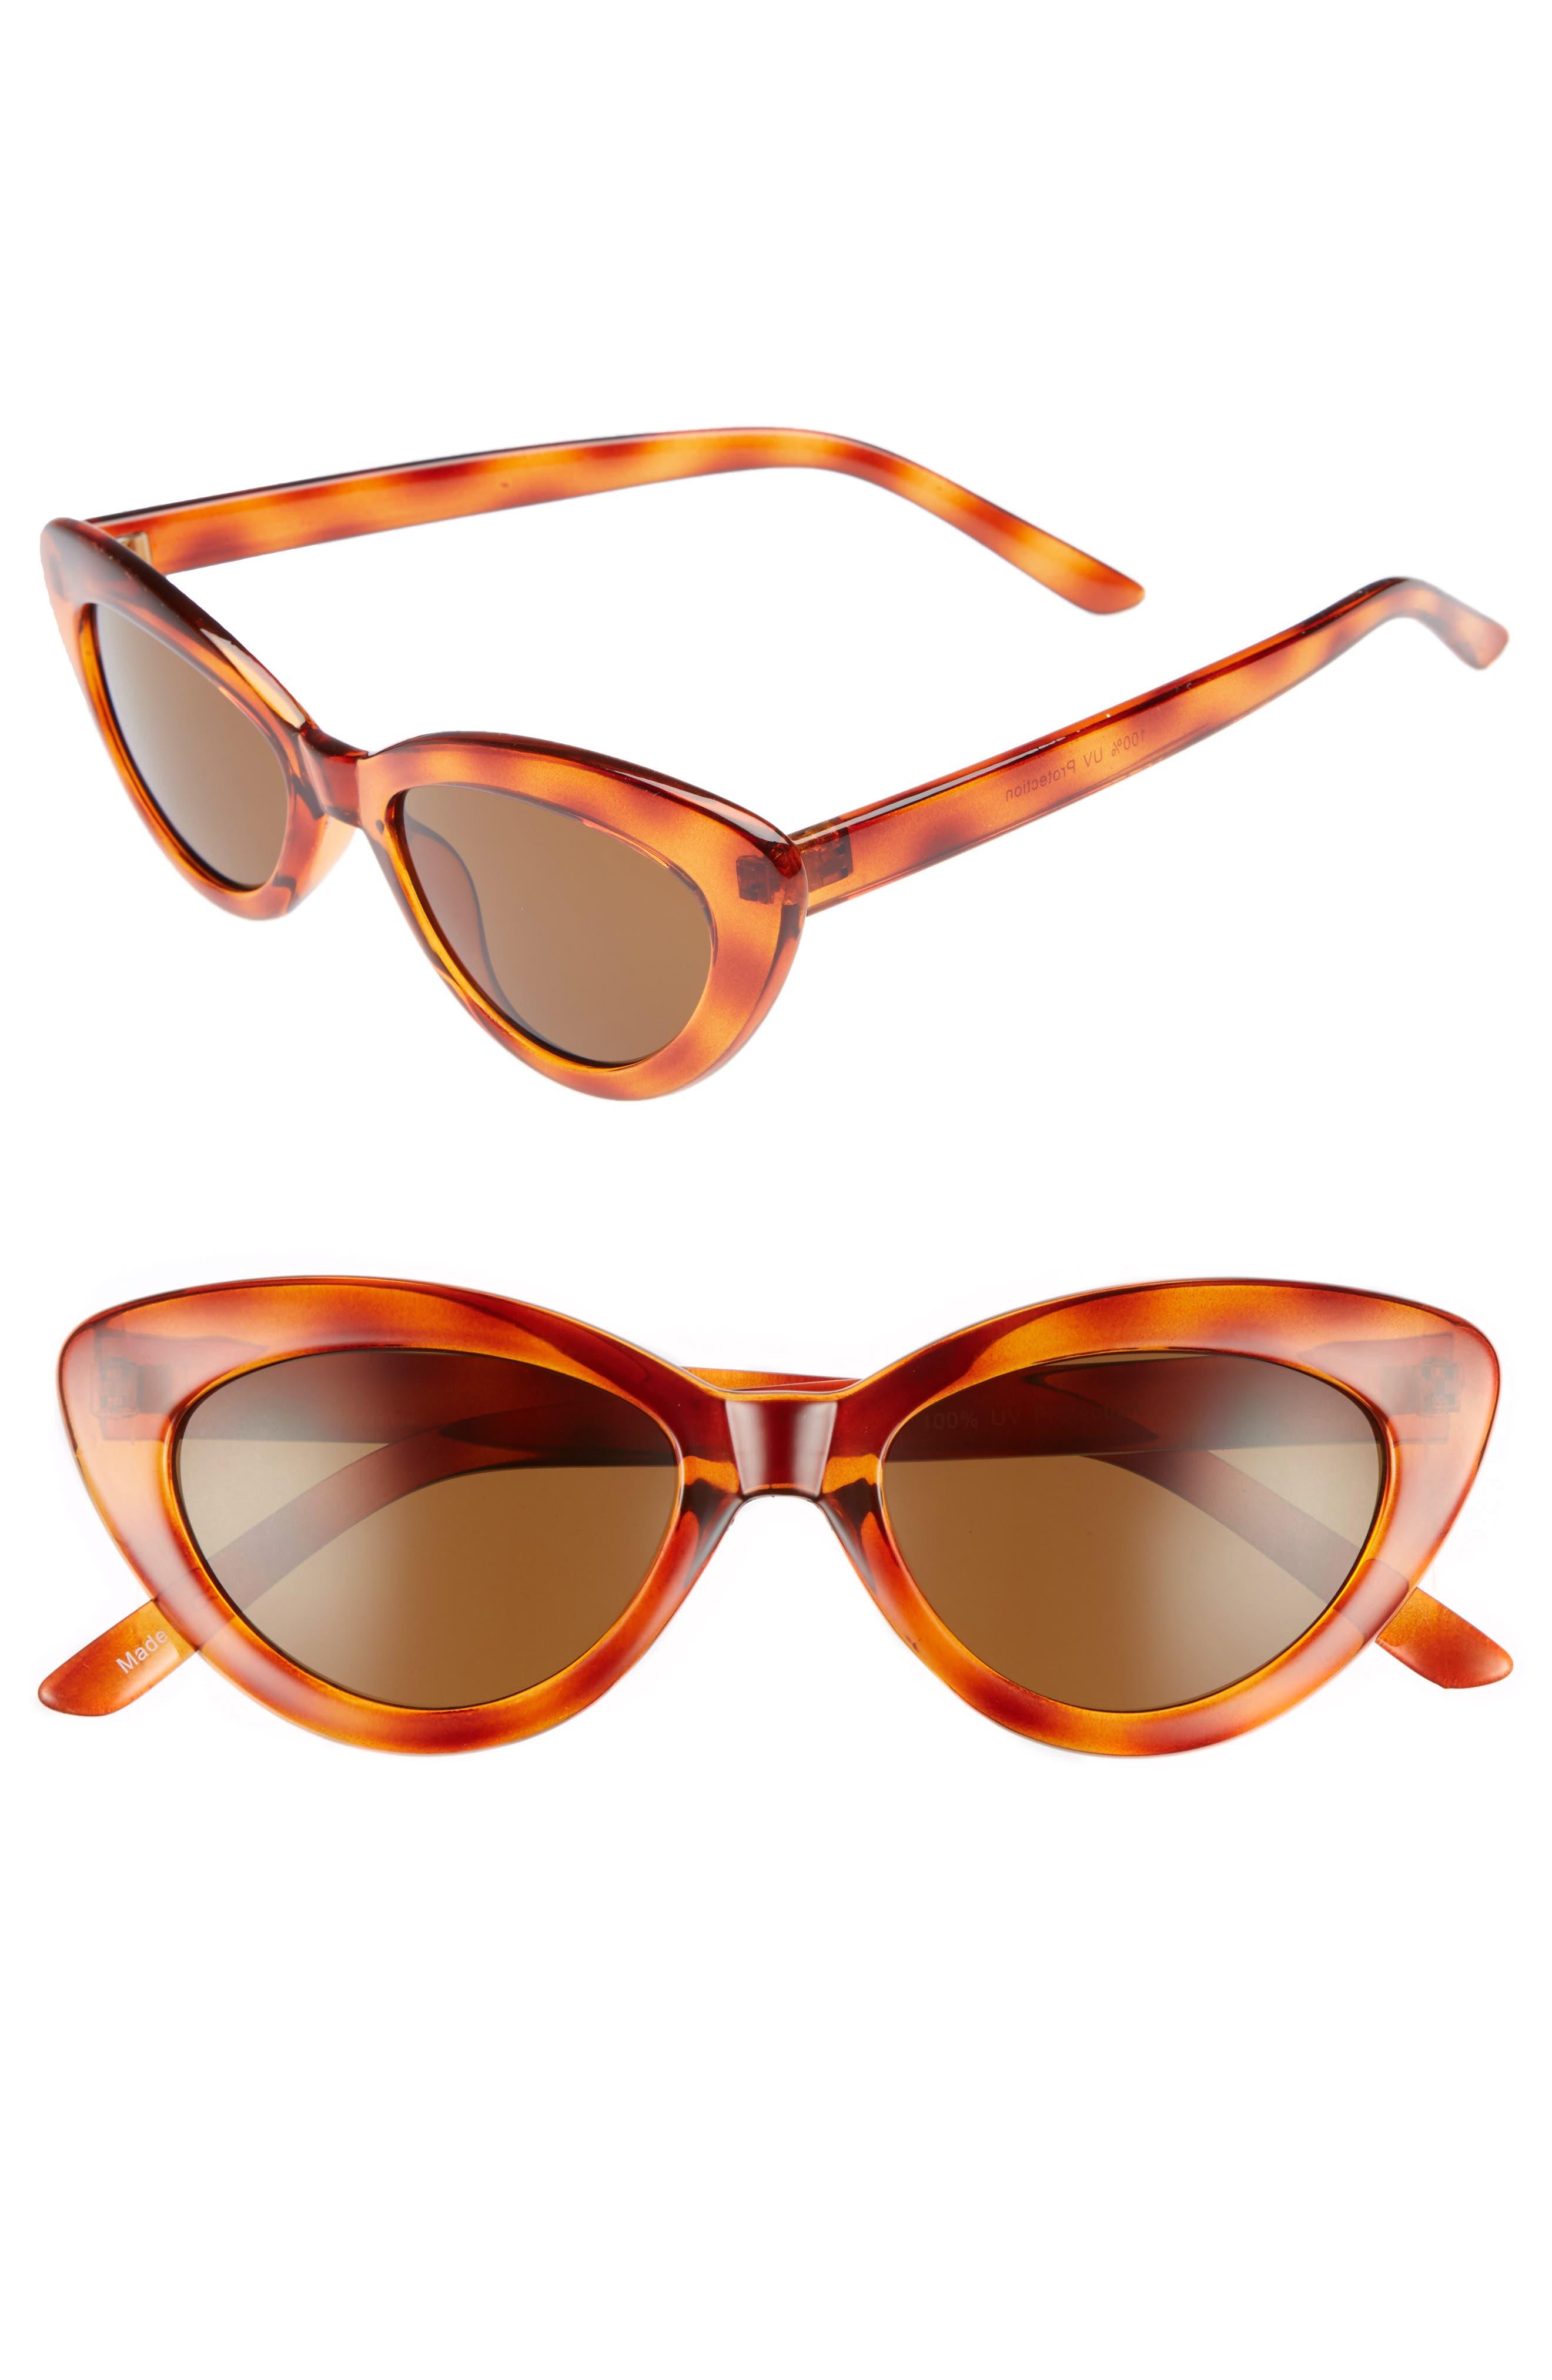 51mm Mini Cat Eye Sunglasses,                             Main thumbnail 1, color,                             Tort